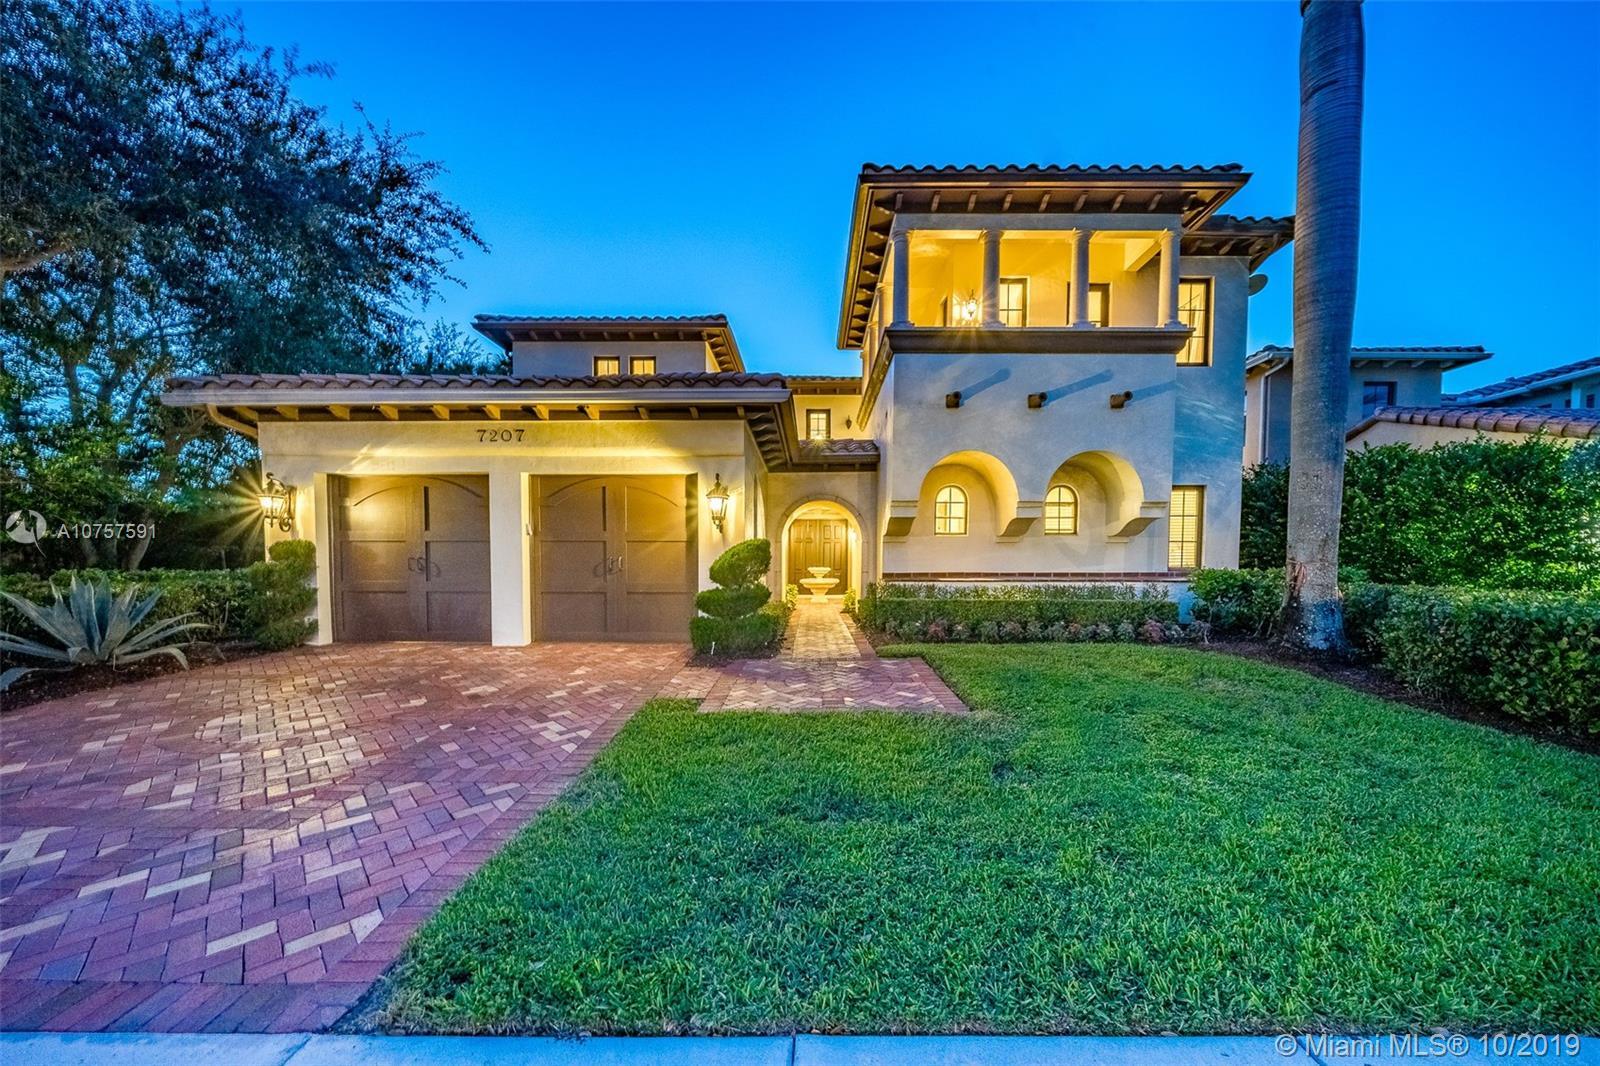 7207  Wisteria Ave  For Sale A10757591, FL